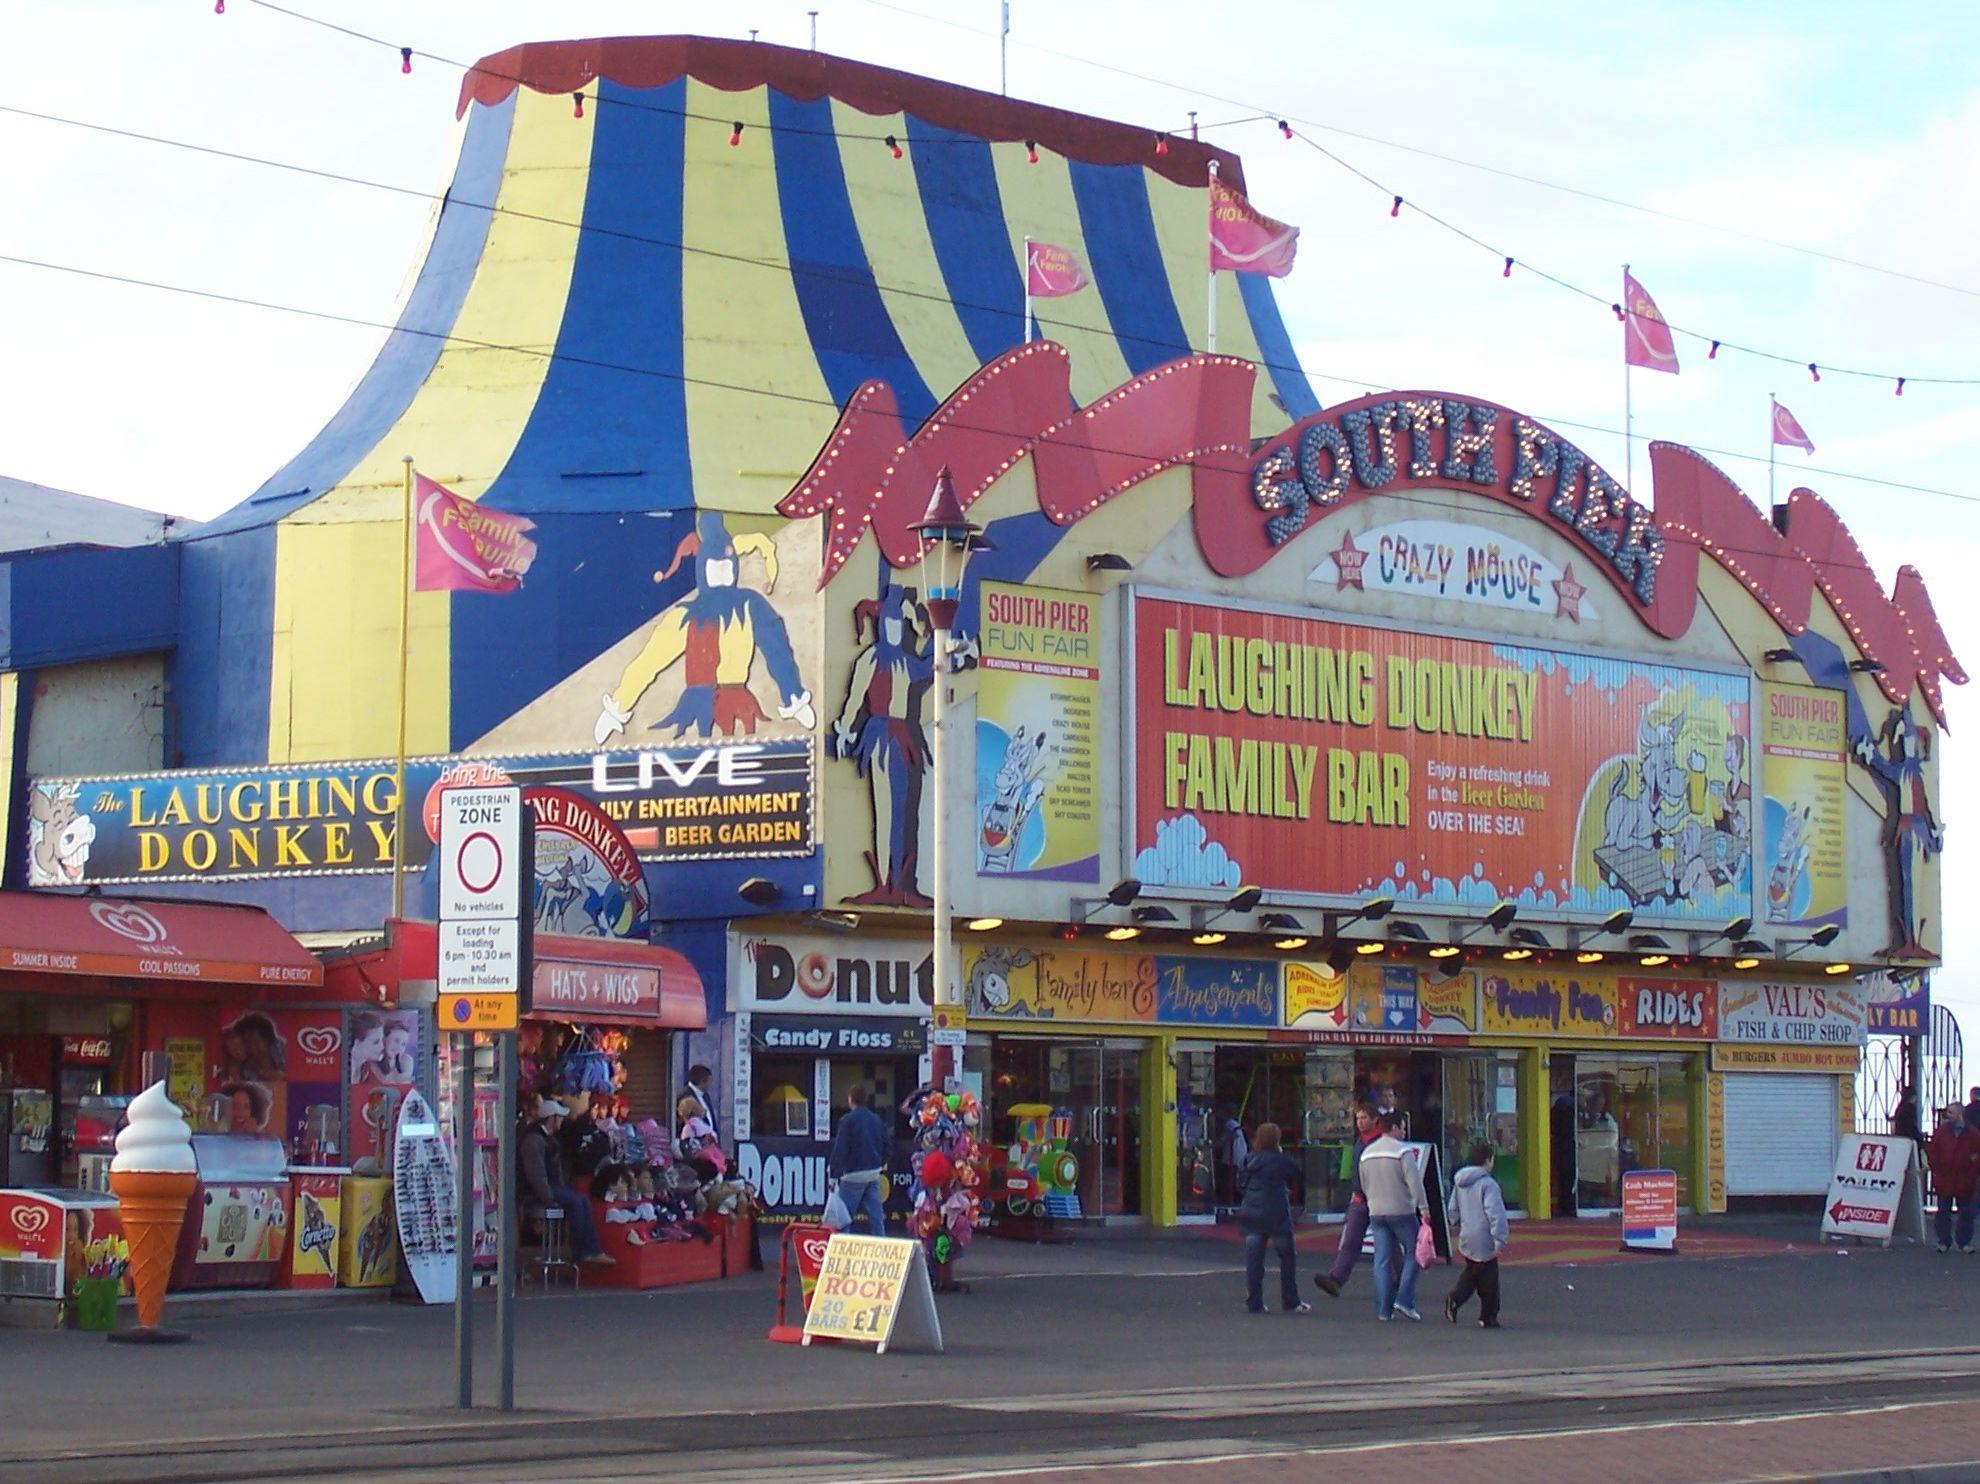 south pier at Blackpool England united kingdom